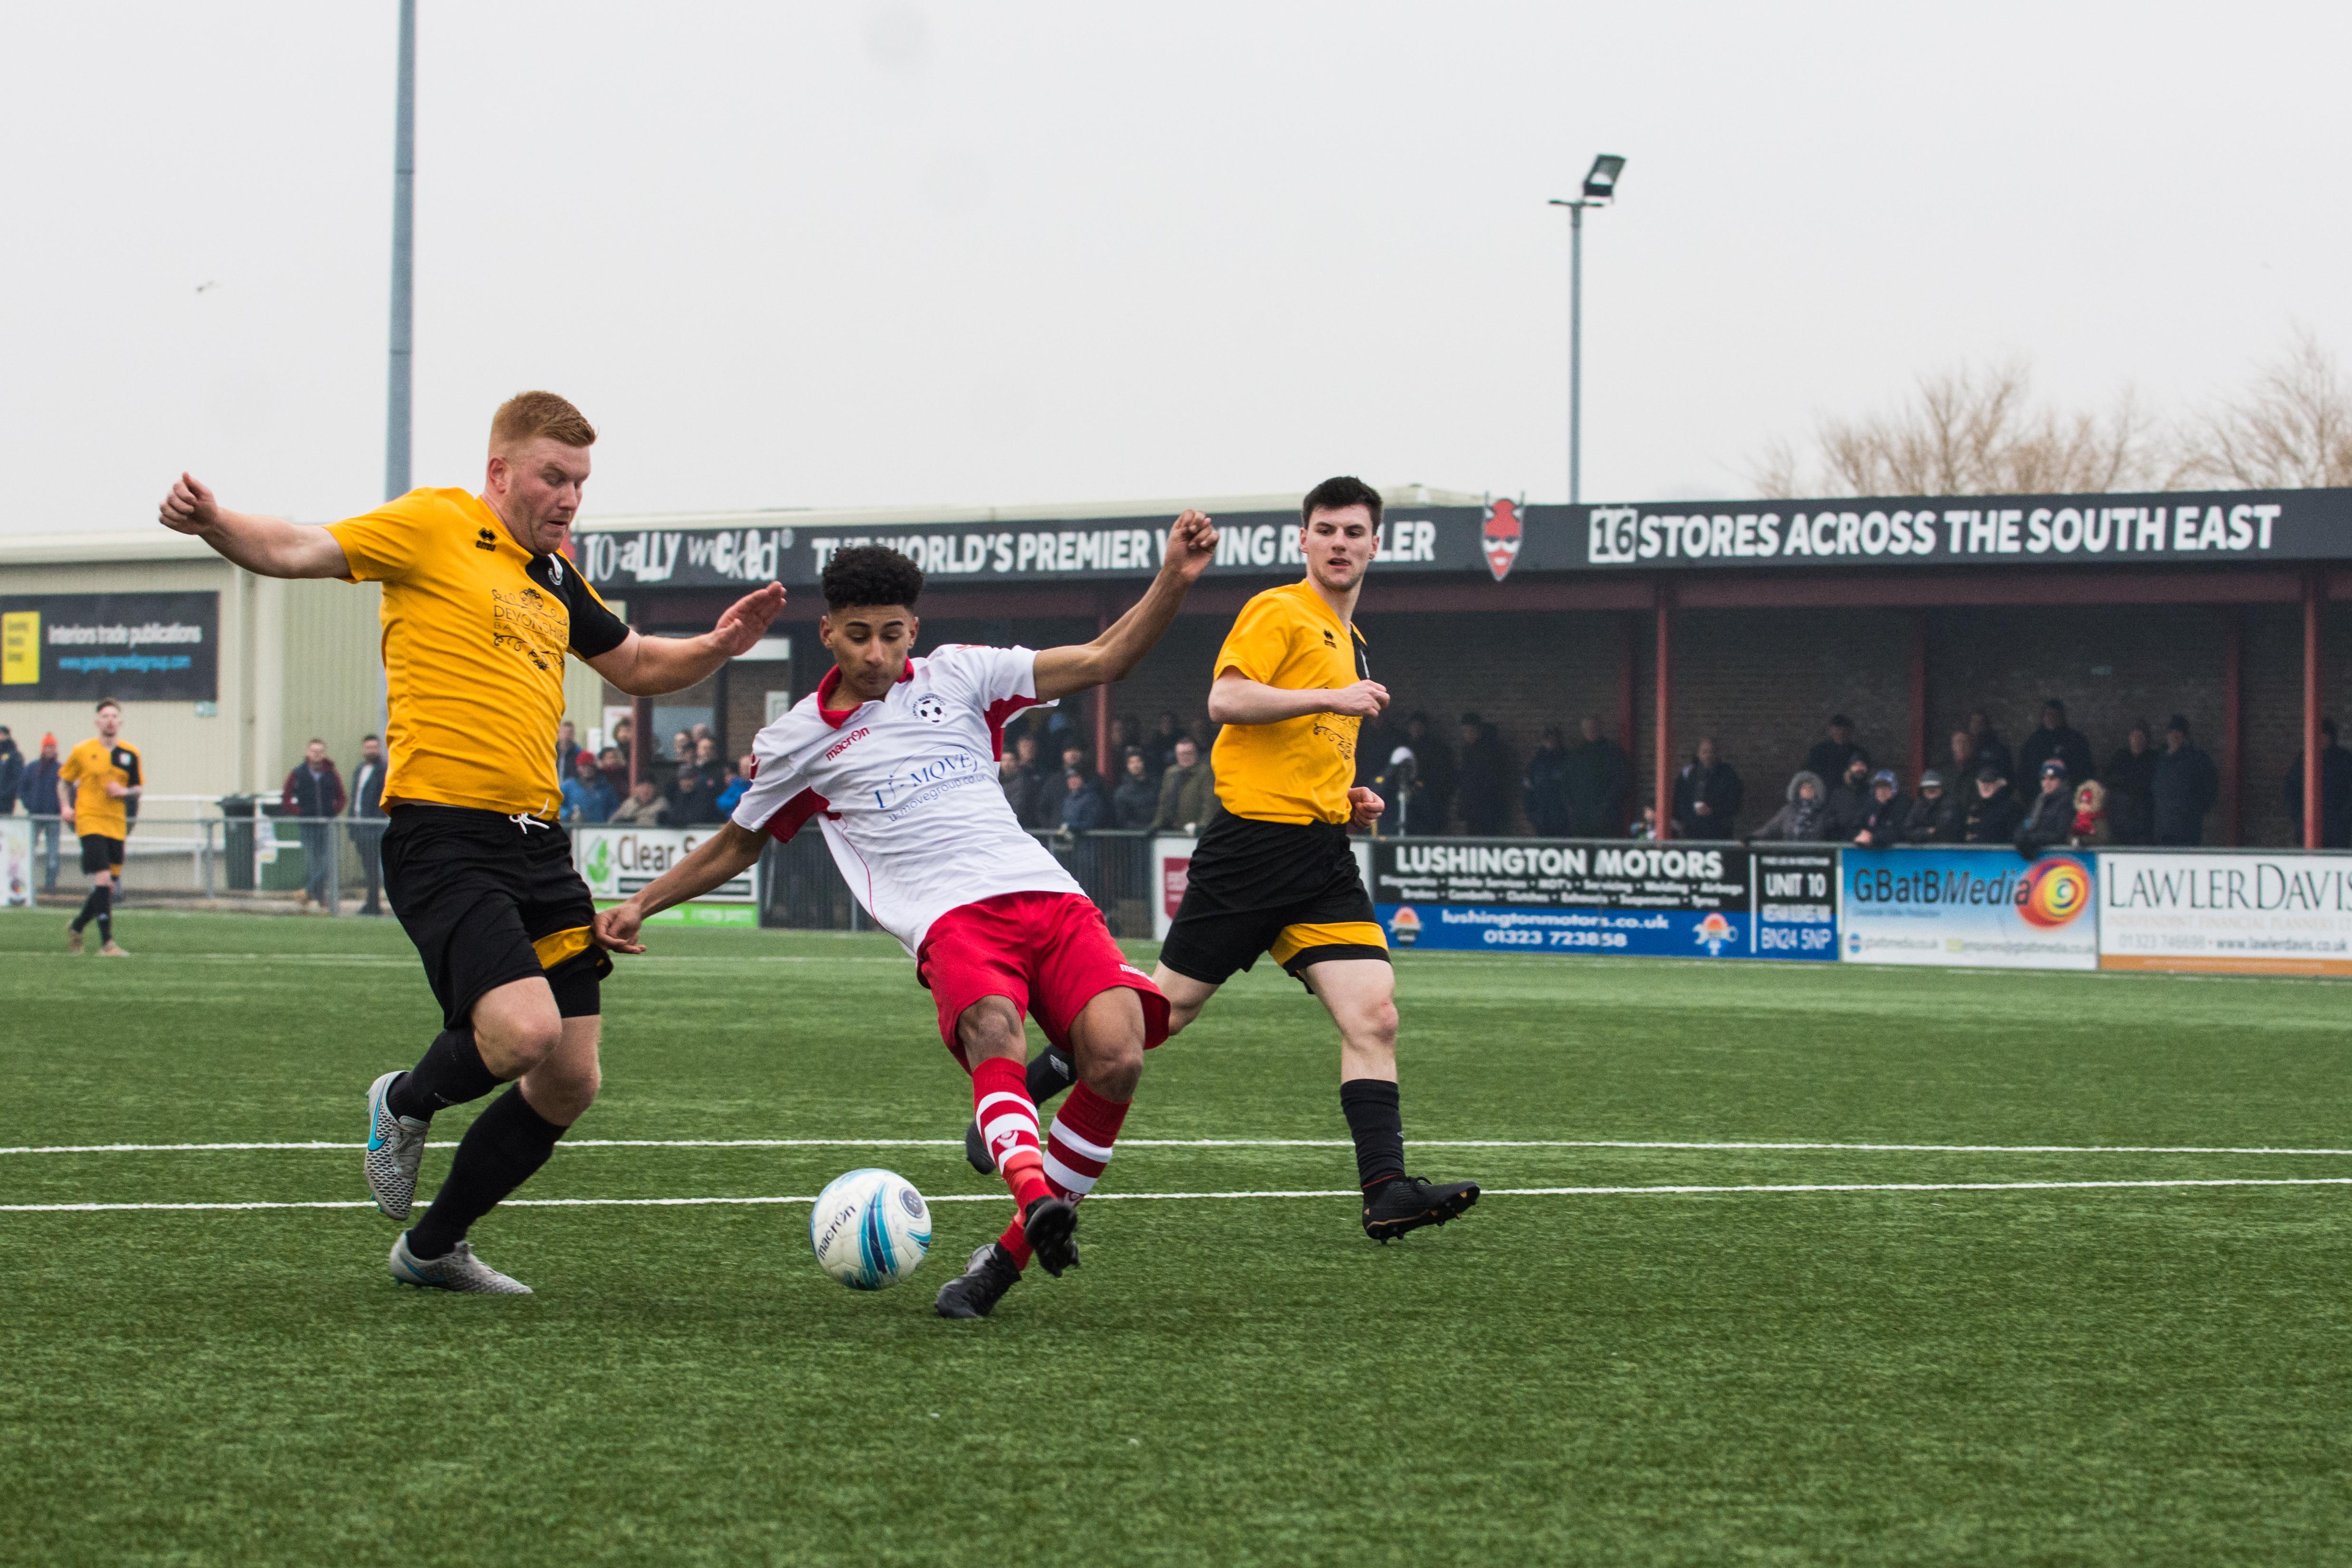 DAVID_JEFFERY Langney Wanderers FC vs Bexhill United FC 03.03.18 57